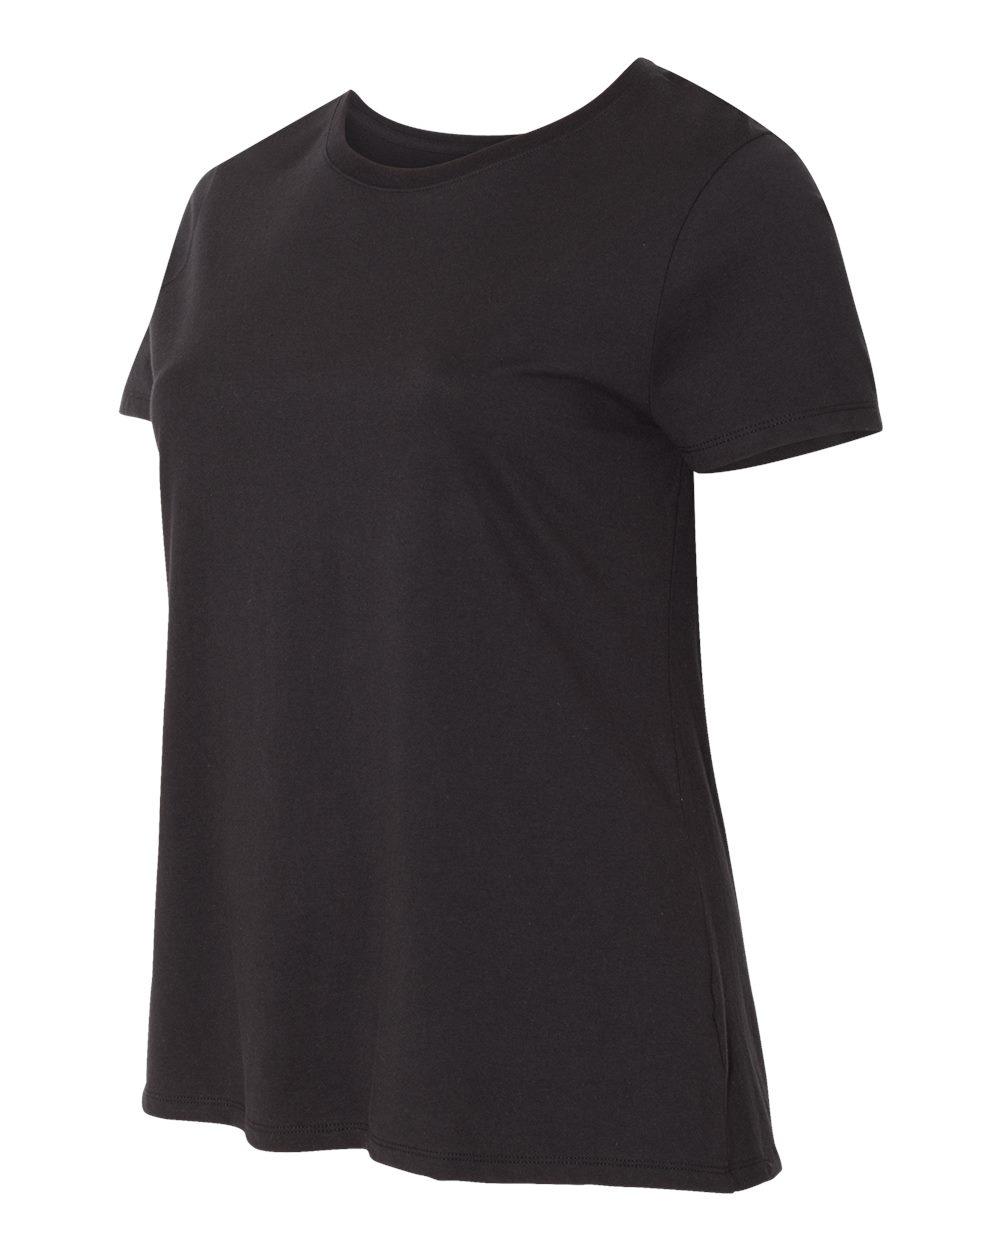 45ca2ce0 Hanes JMS20 - Just My Size Women's Short Sleeve Tee $6.68 - Women's ...